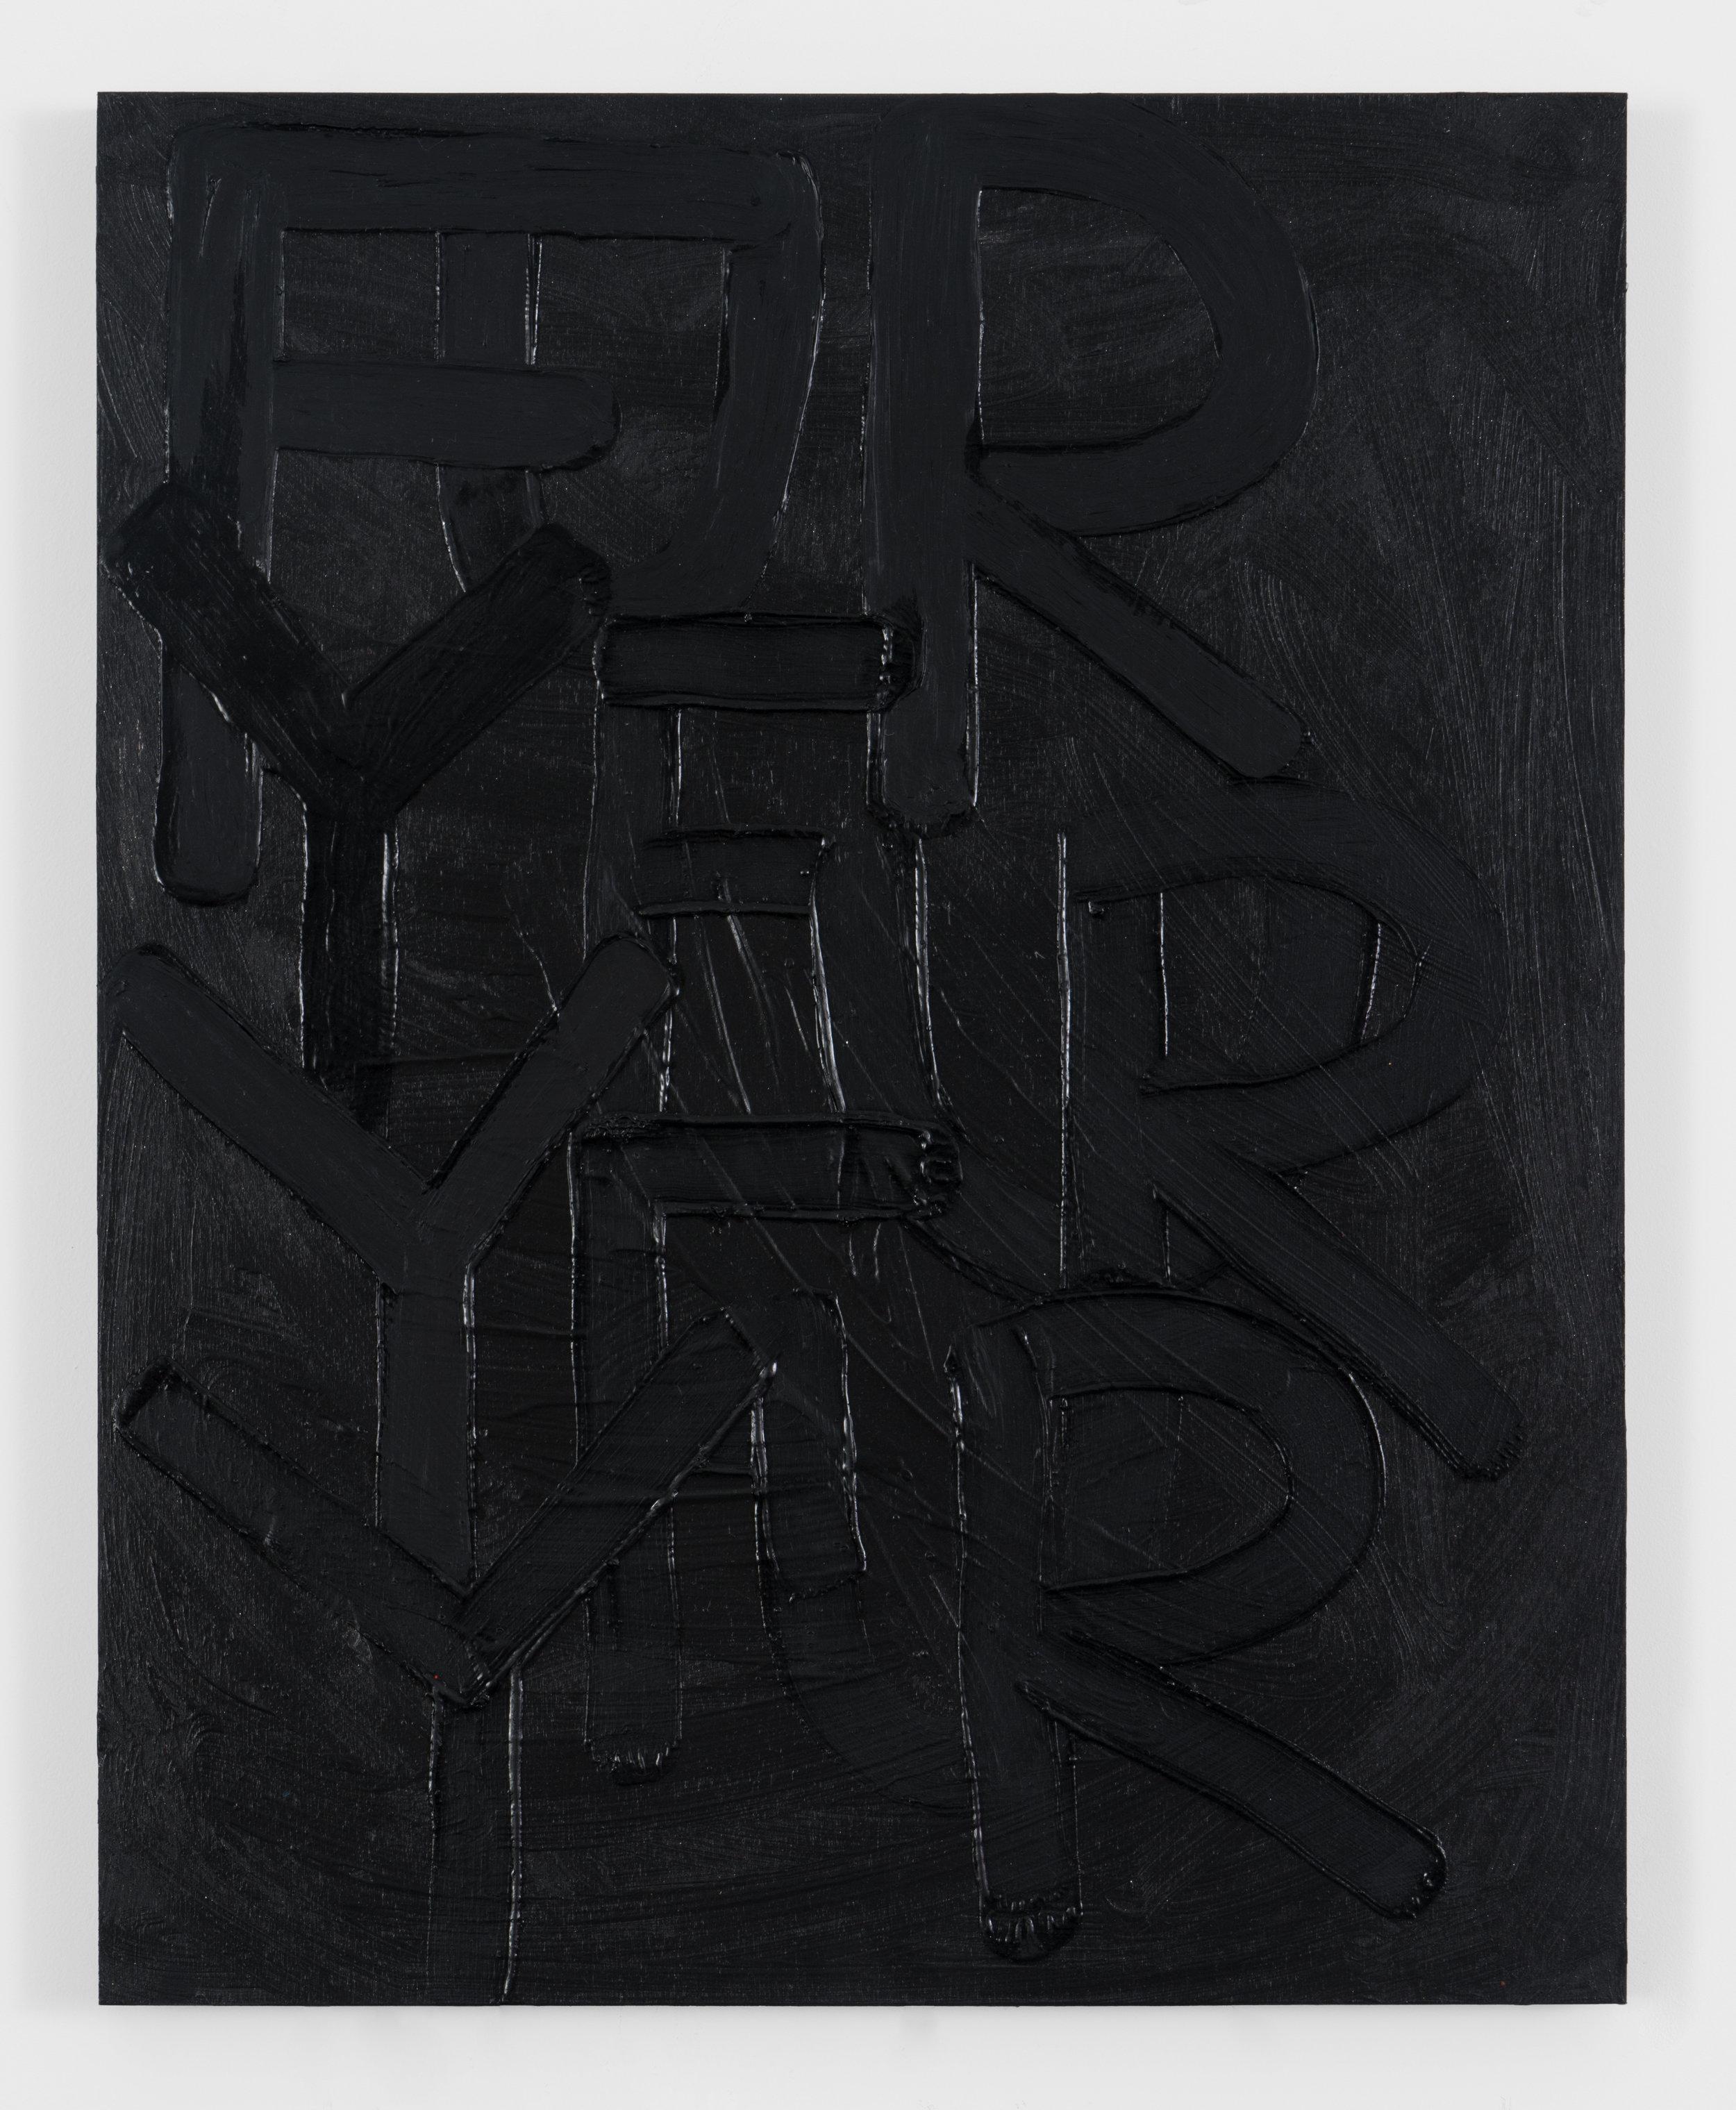 furyfuryfury, 2017, Oil on wood, 20 x 16 inches